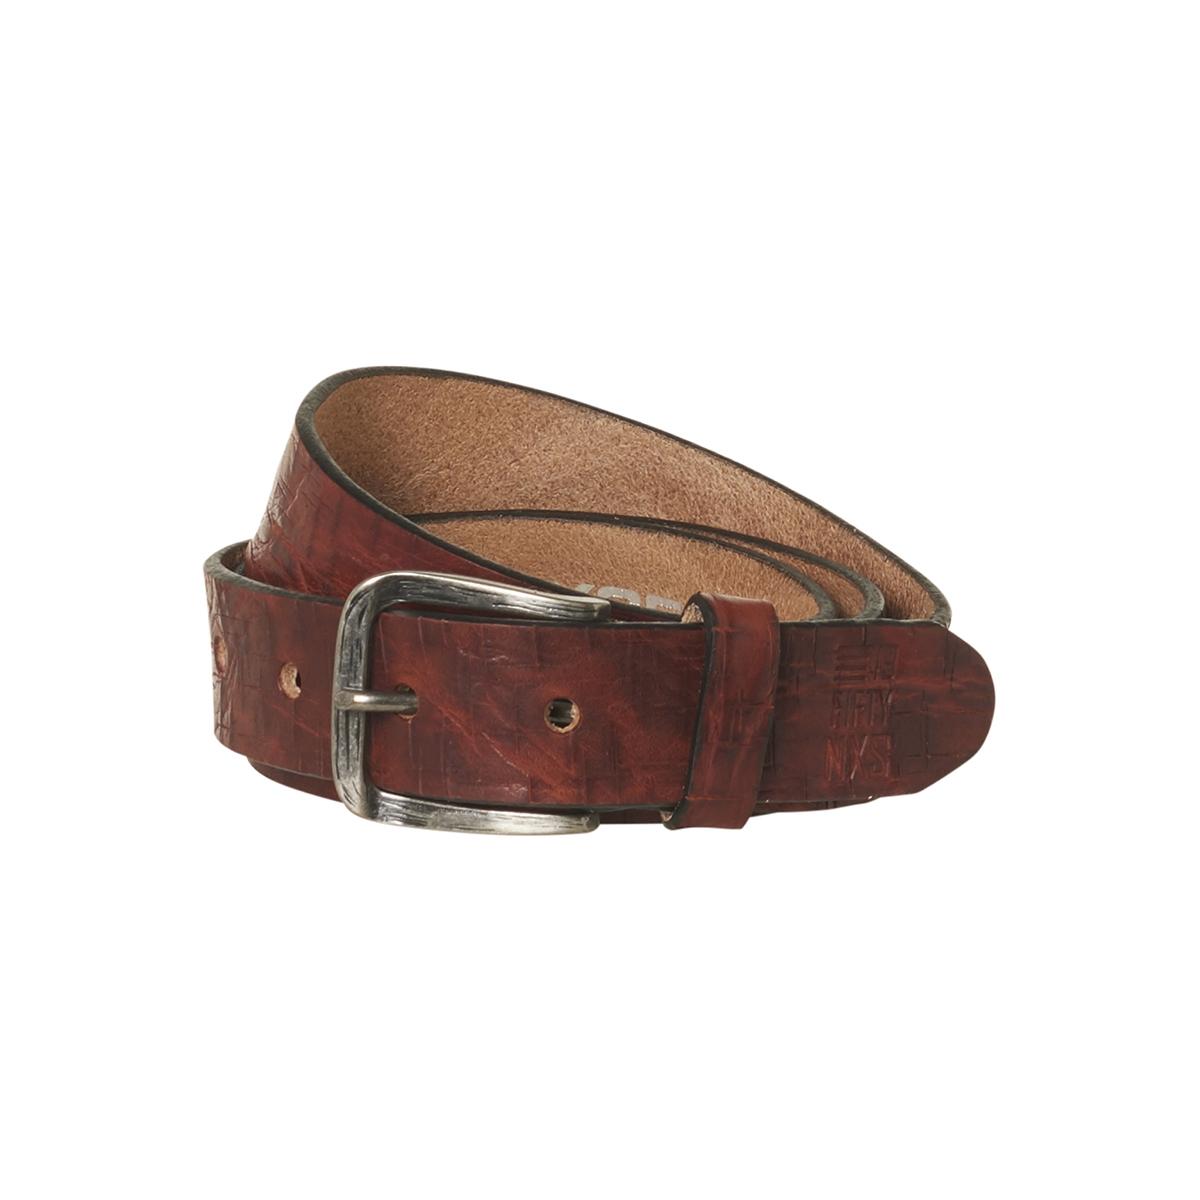 leather belt 92blt52 no-excess riem 140 camel